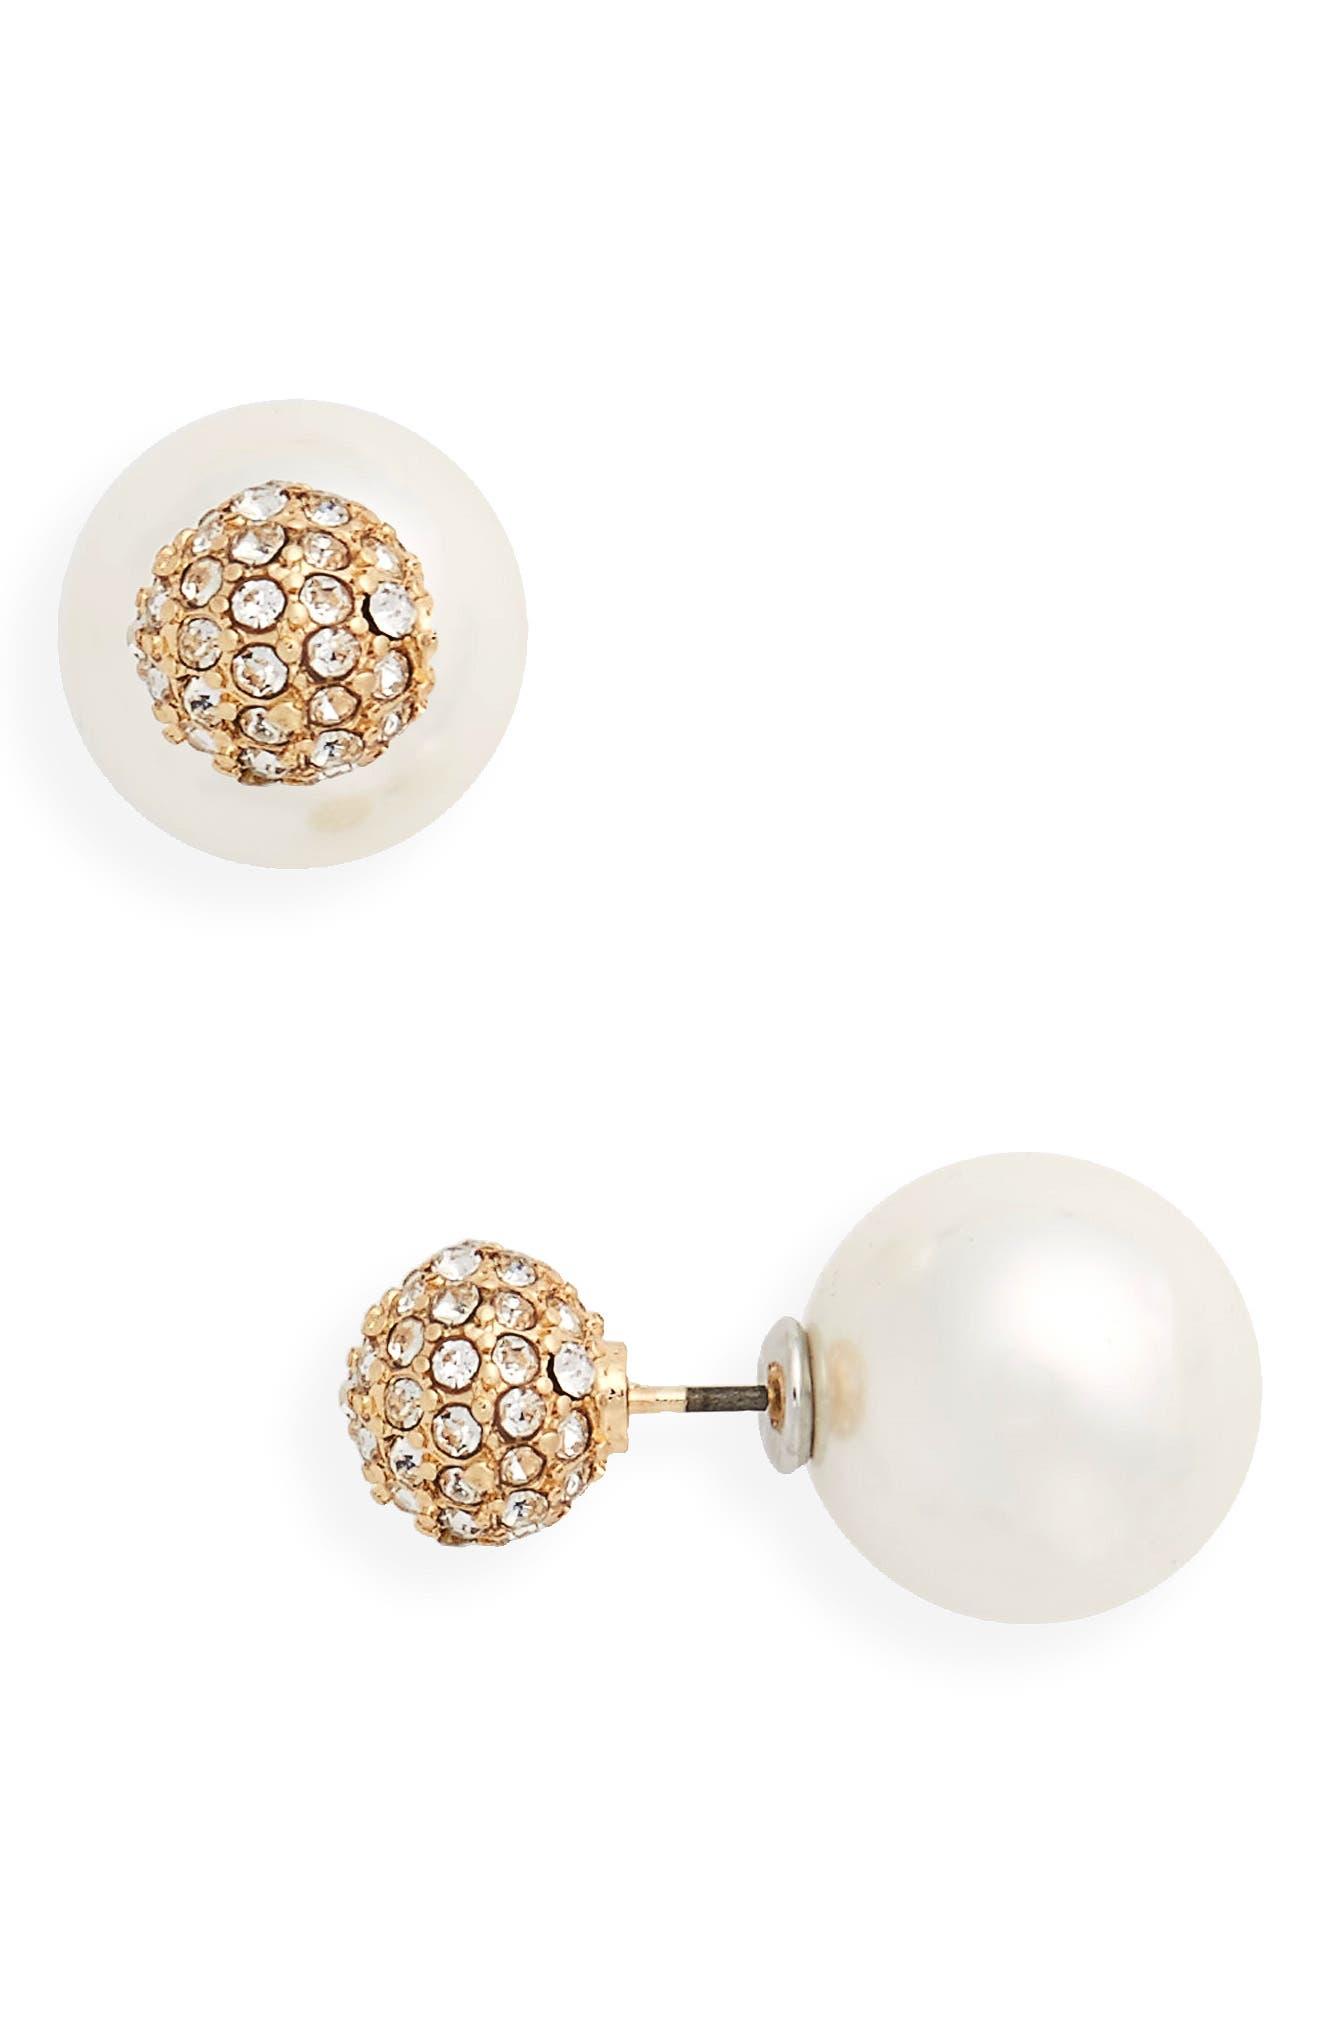 Imitation Pearl & Crystal Front/Back Earrings,                             Main thumbnail 1, color,                             Pearl/ Crystal/ Gold